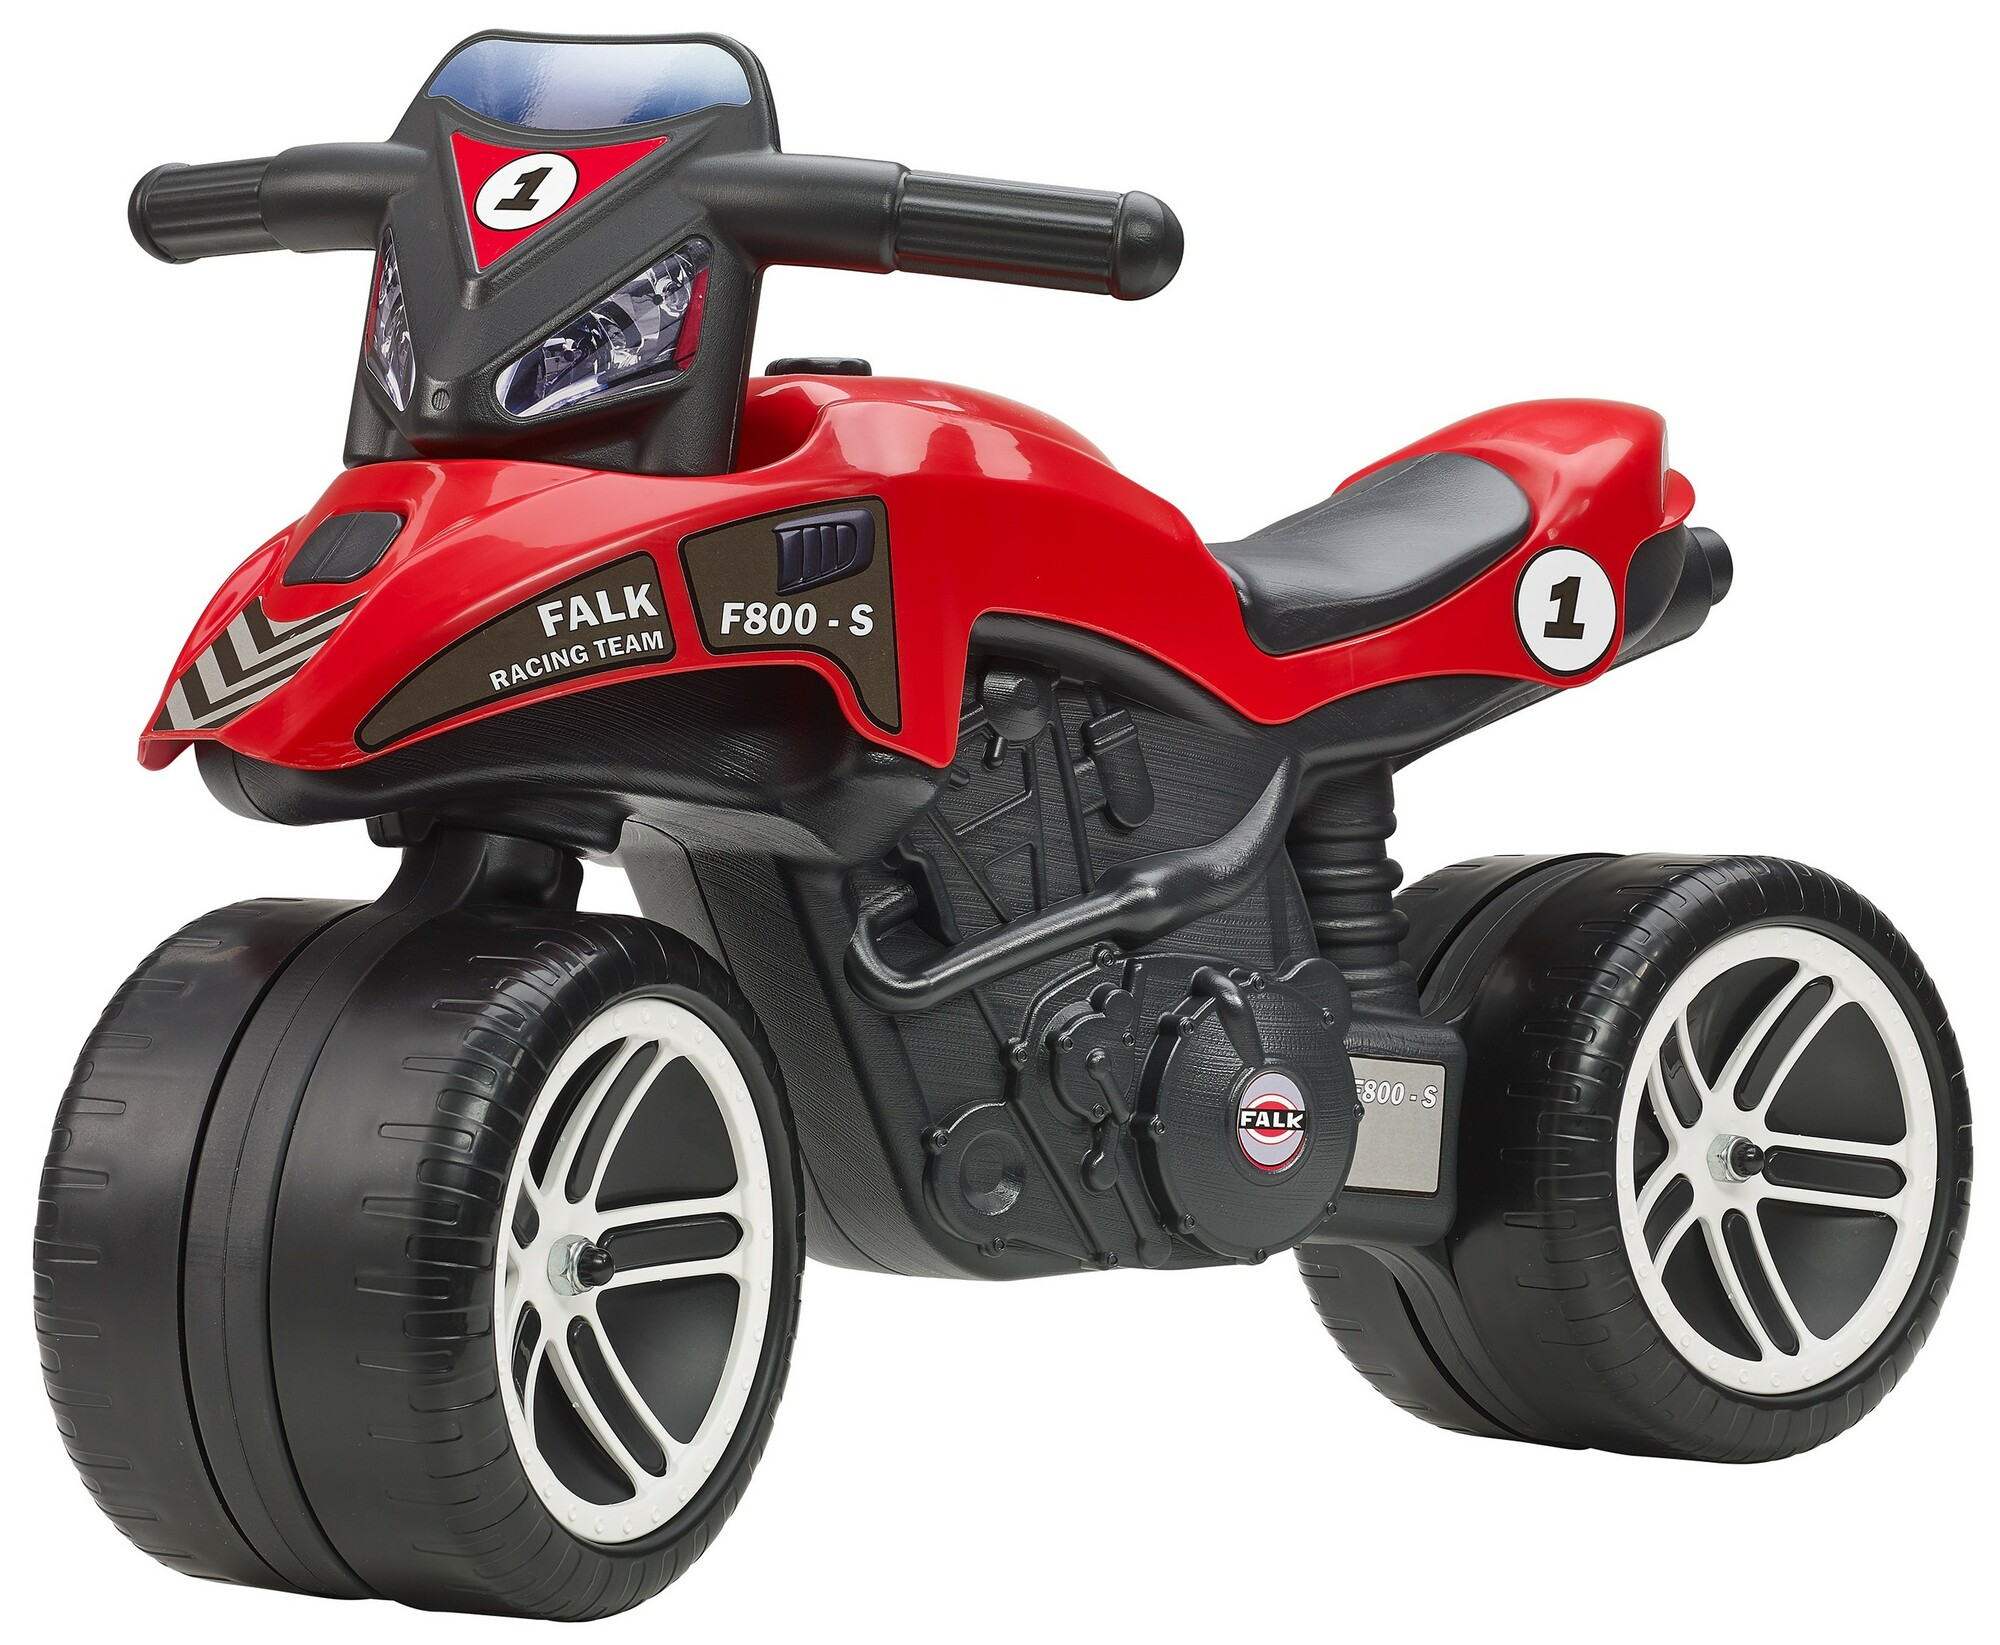 FALK Odrážadlo 500 Moto Racing Team červené